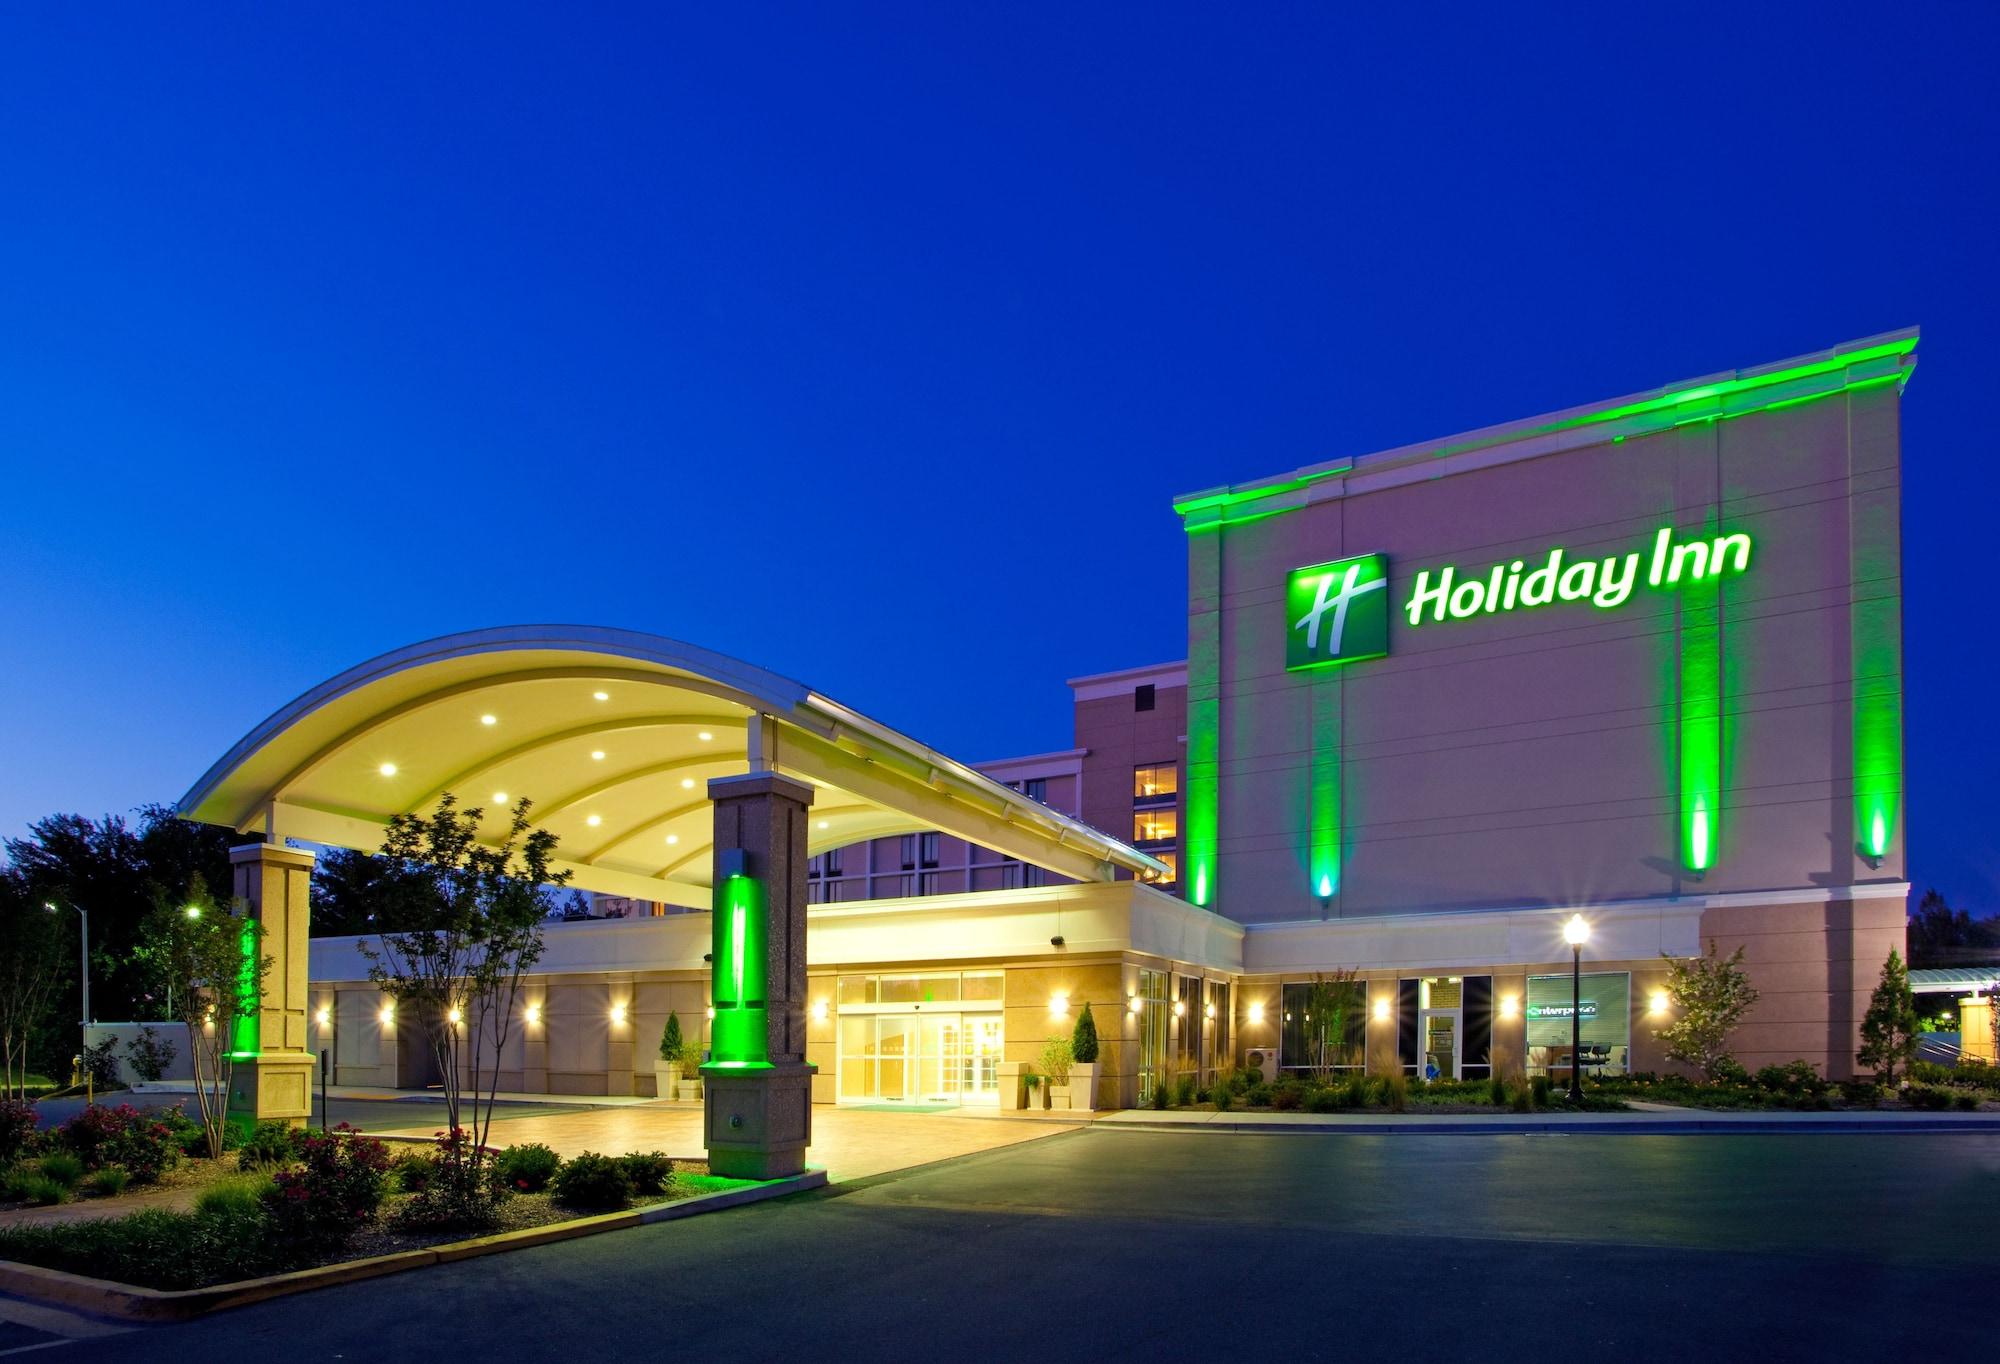 Holiday Inn Gaithersburg, Montgomery